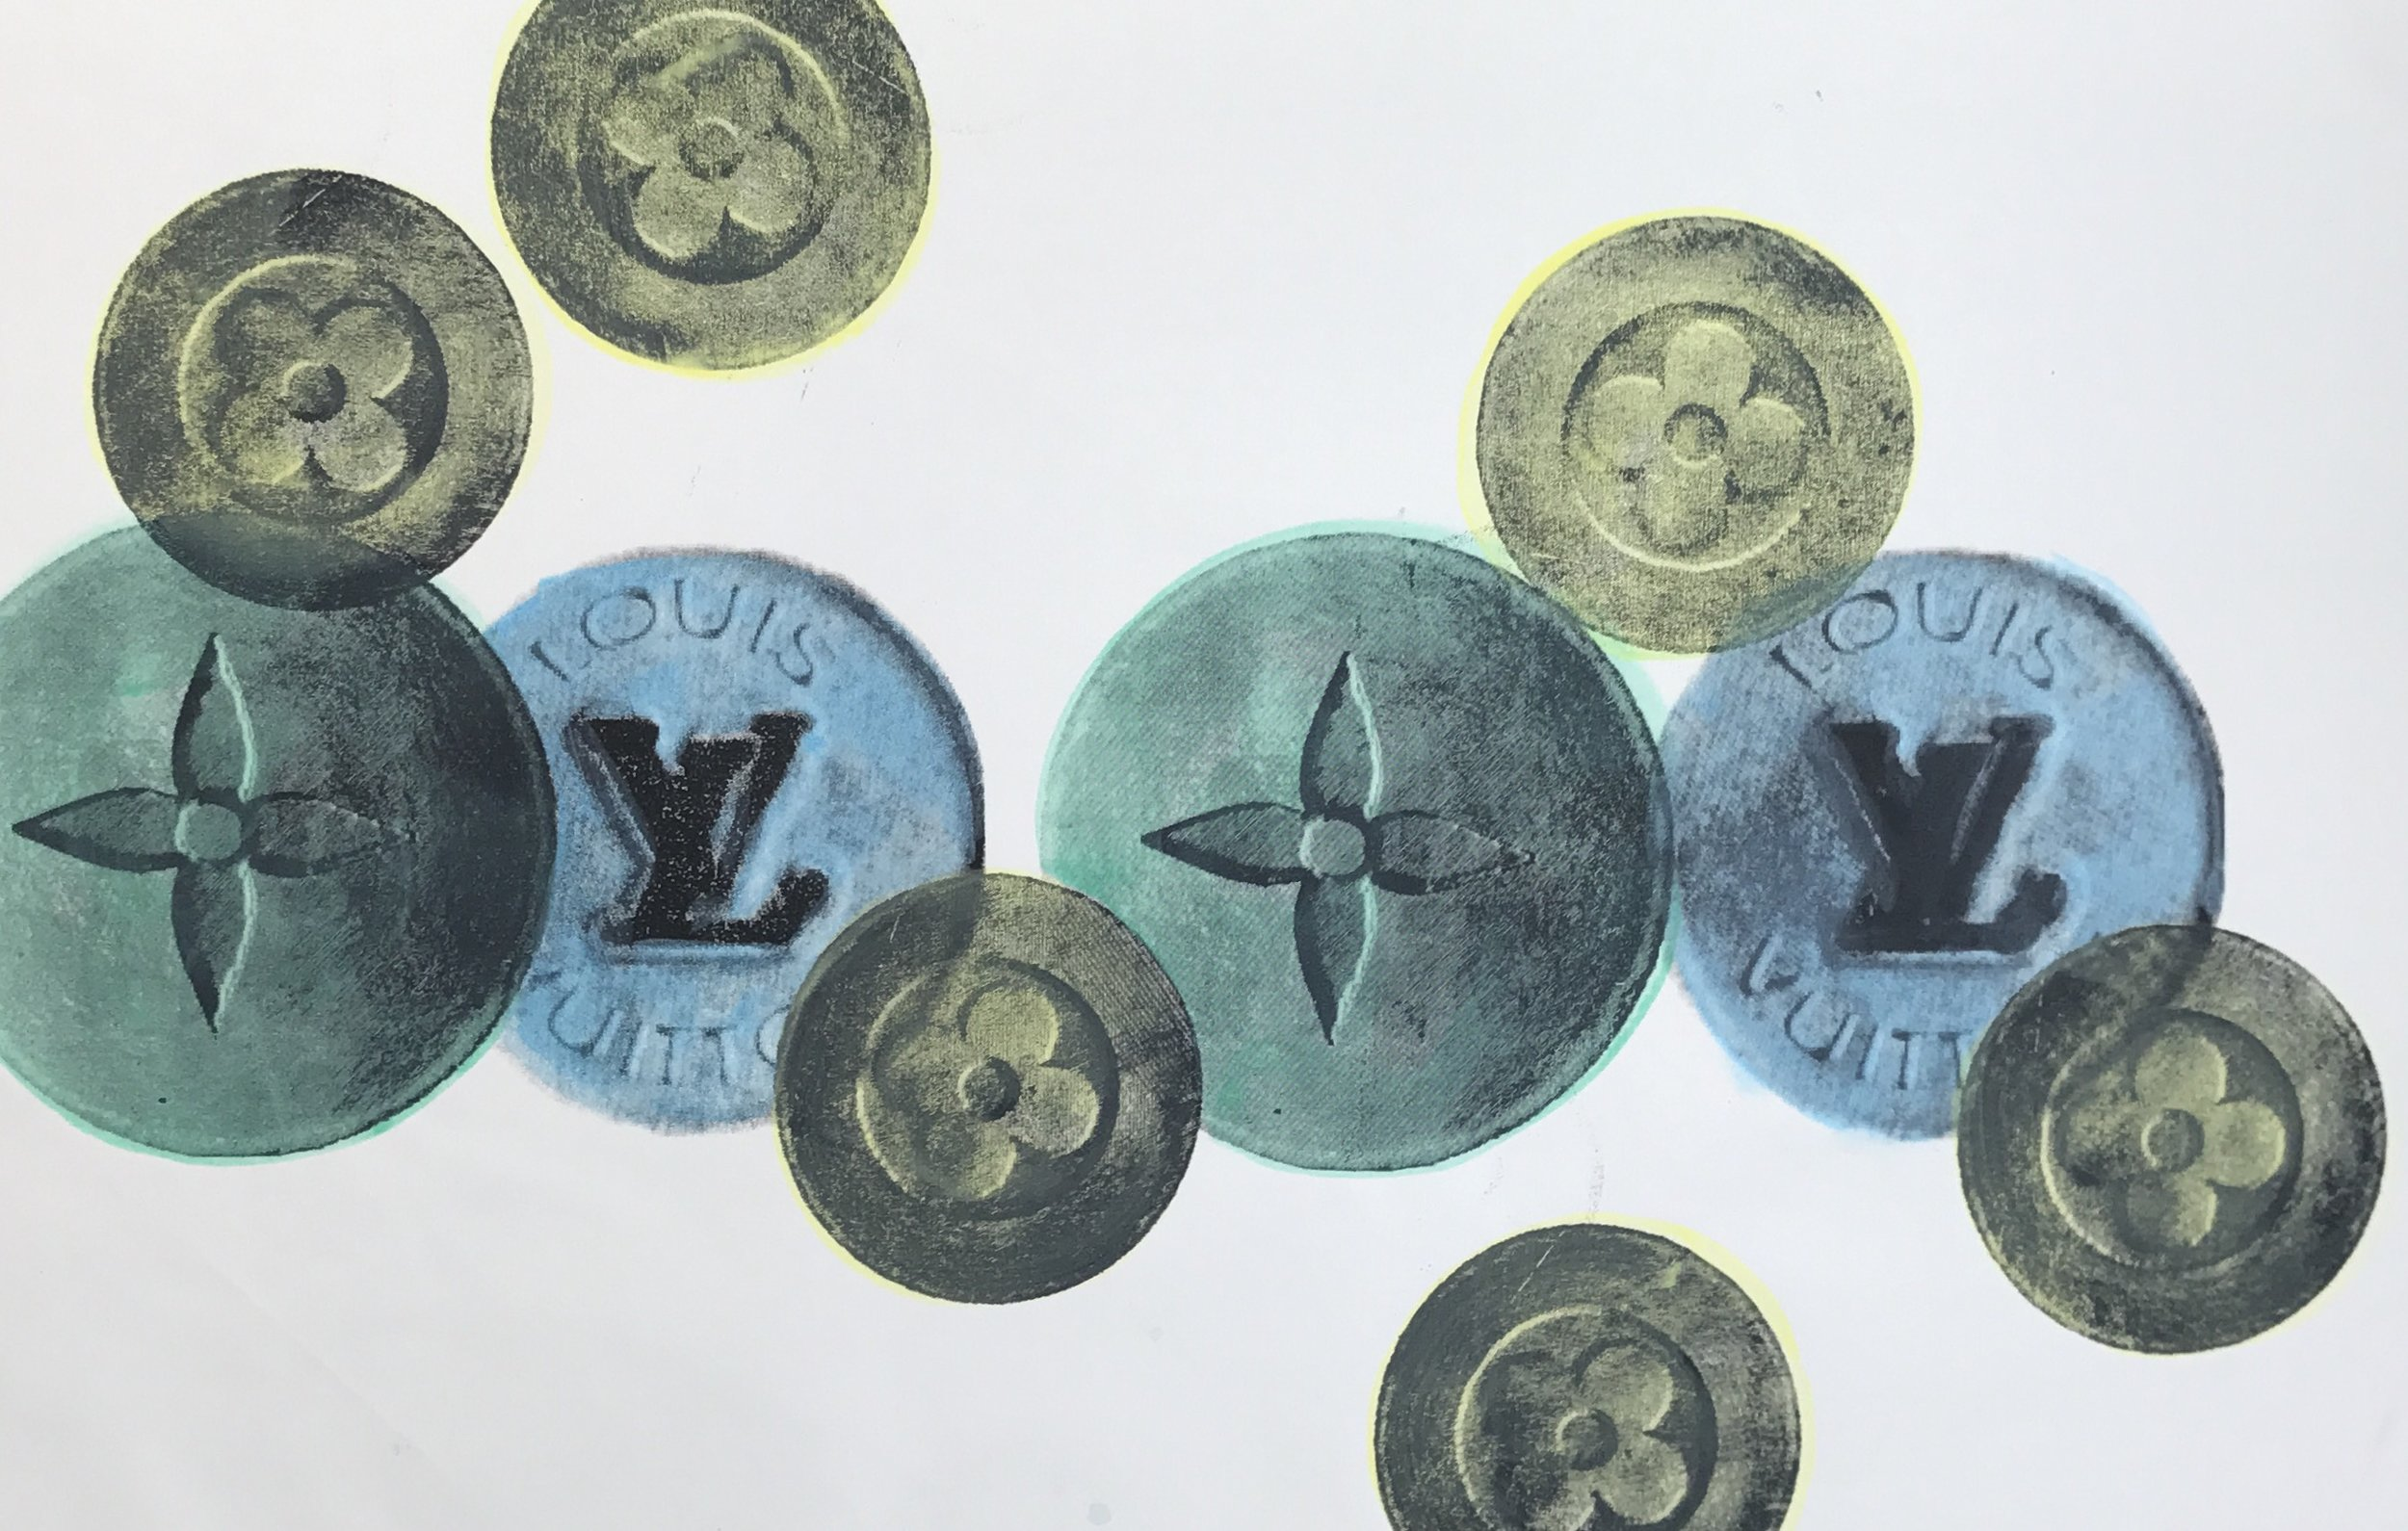 LV Valium - 36 x 24 Acrylic on Canvas, Sep '17Buyer Inquiry